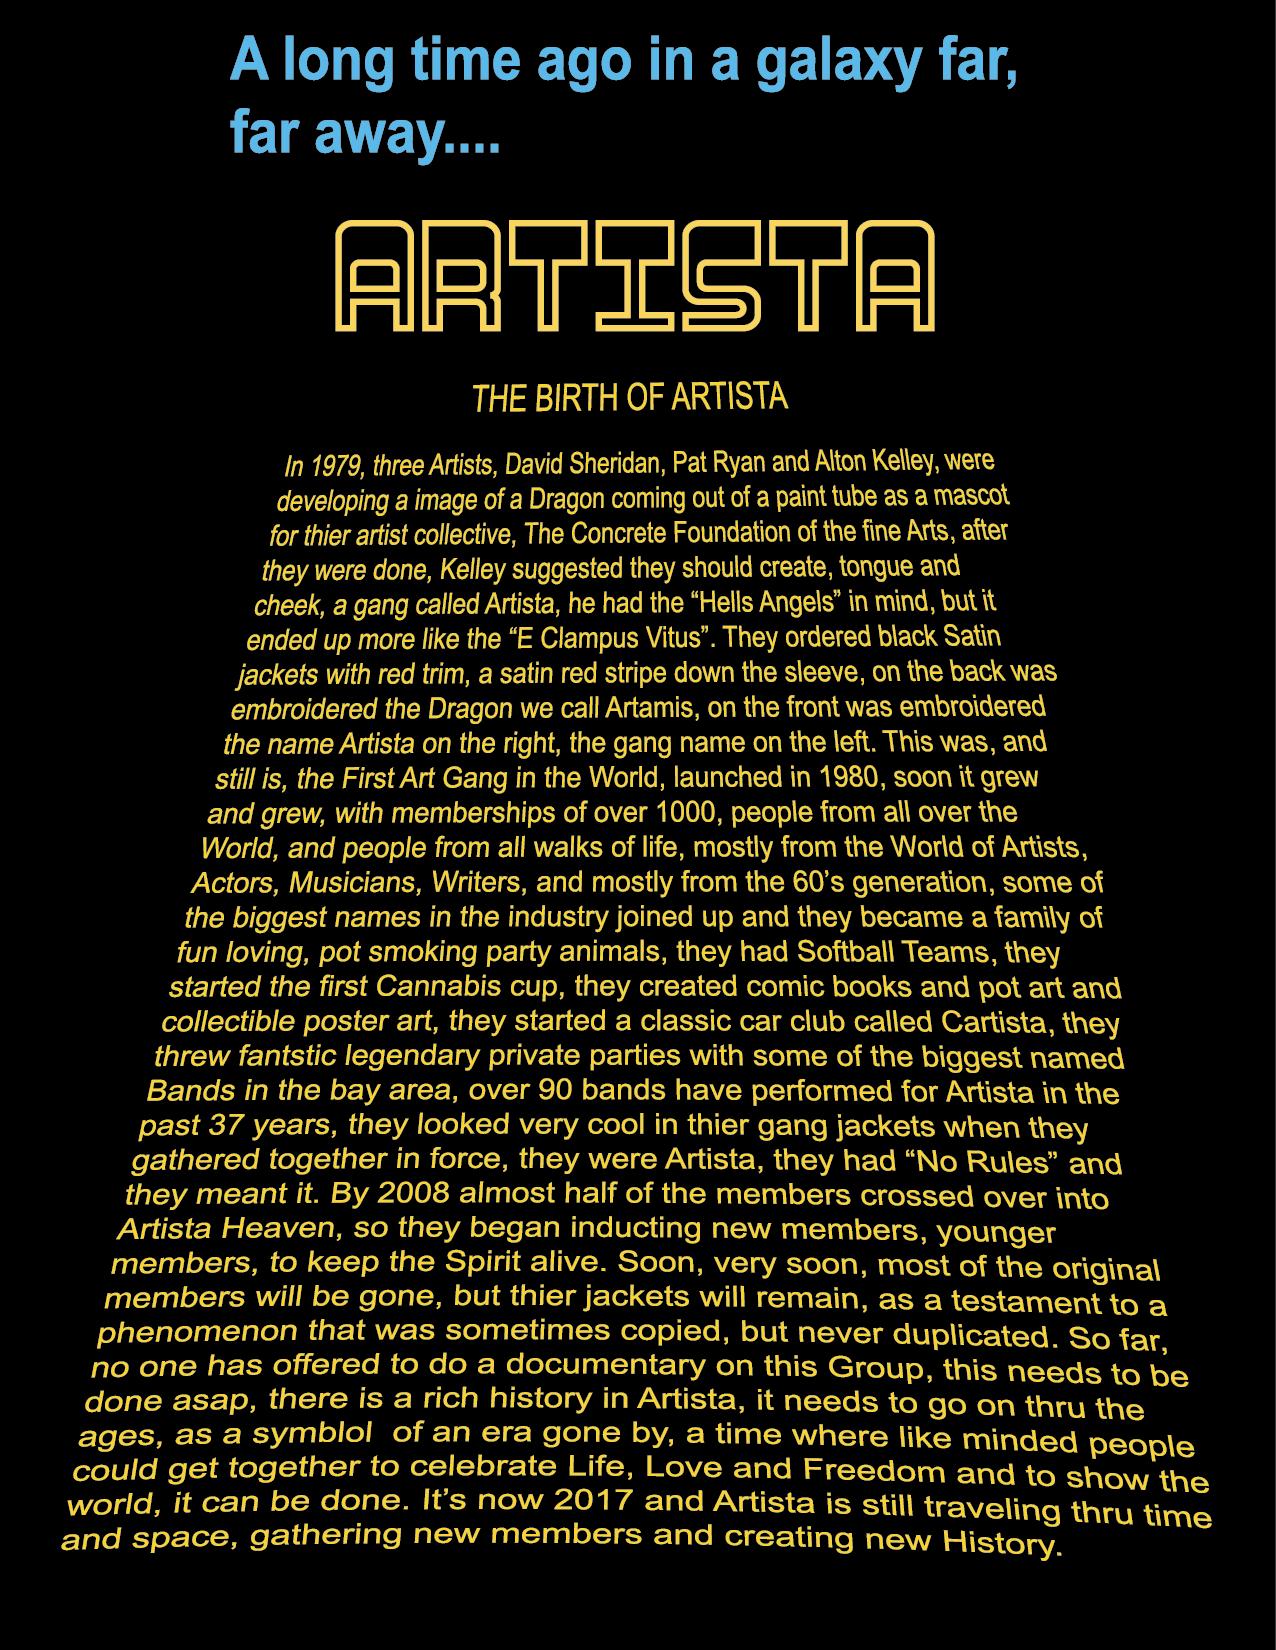 The Birth of Artista